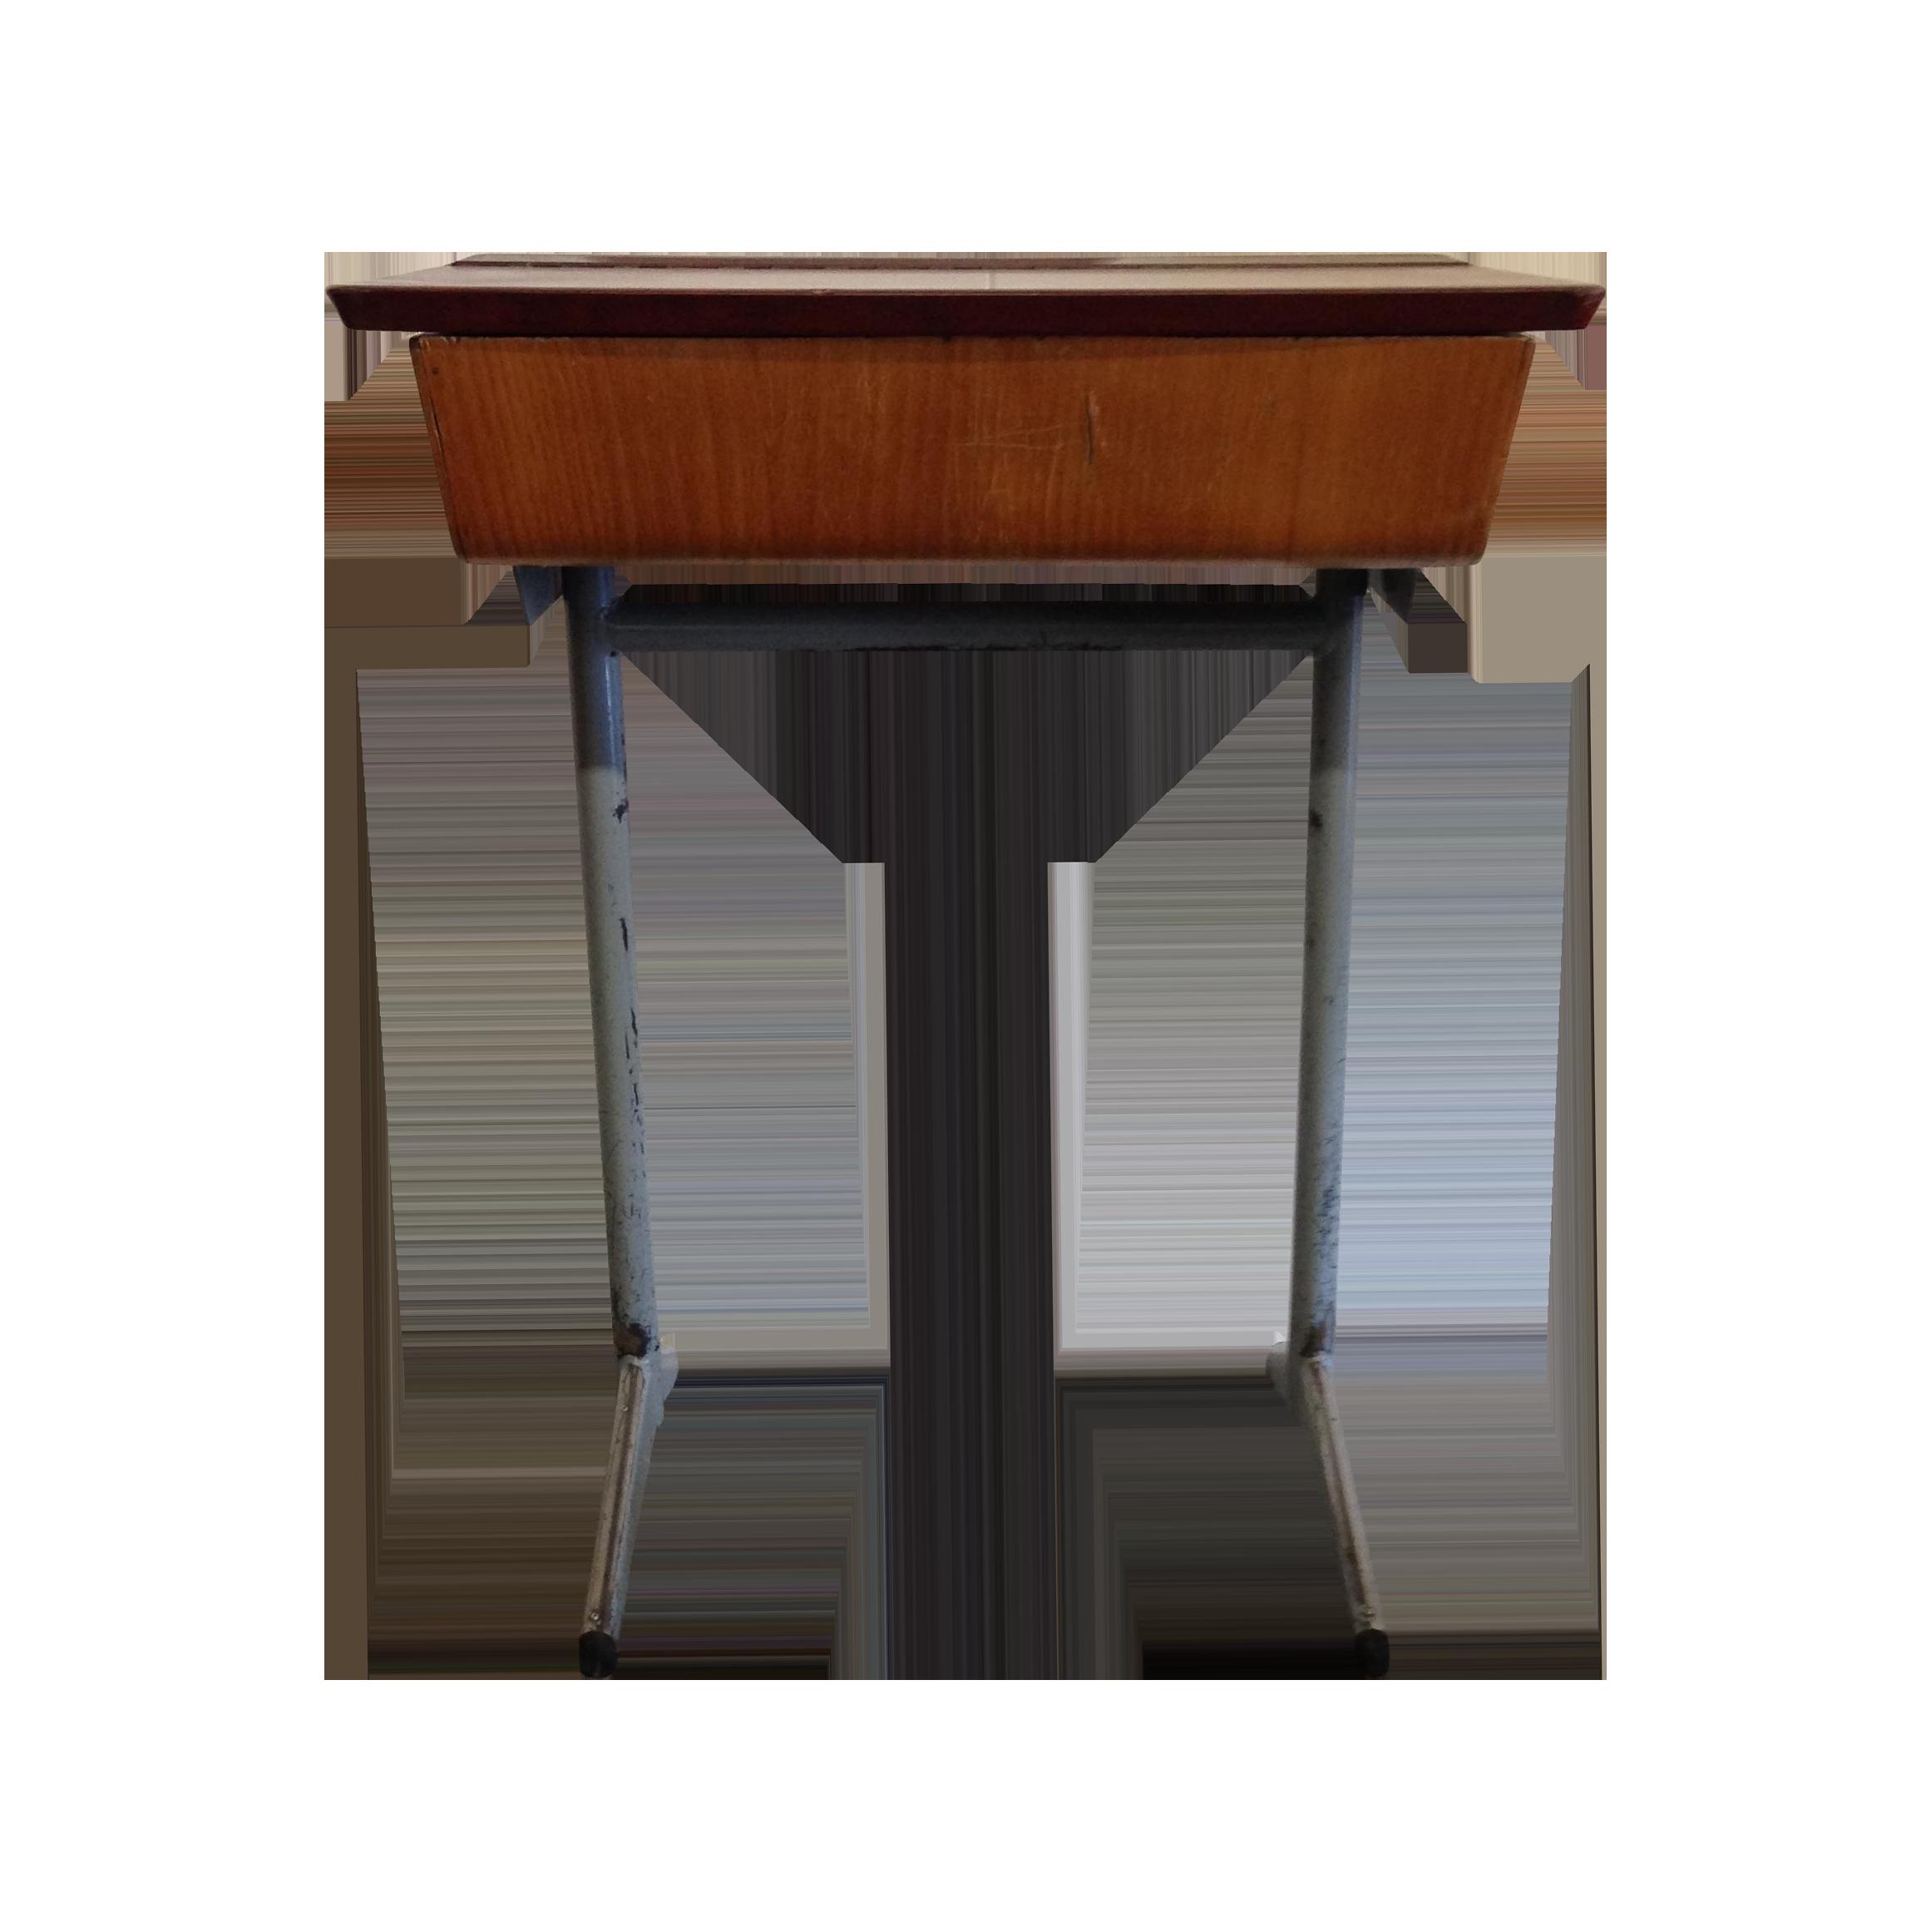 Vintage 1960s Childrenu0027s School Desk